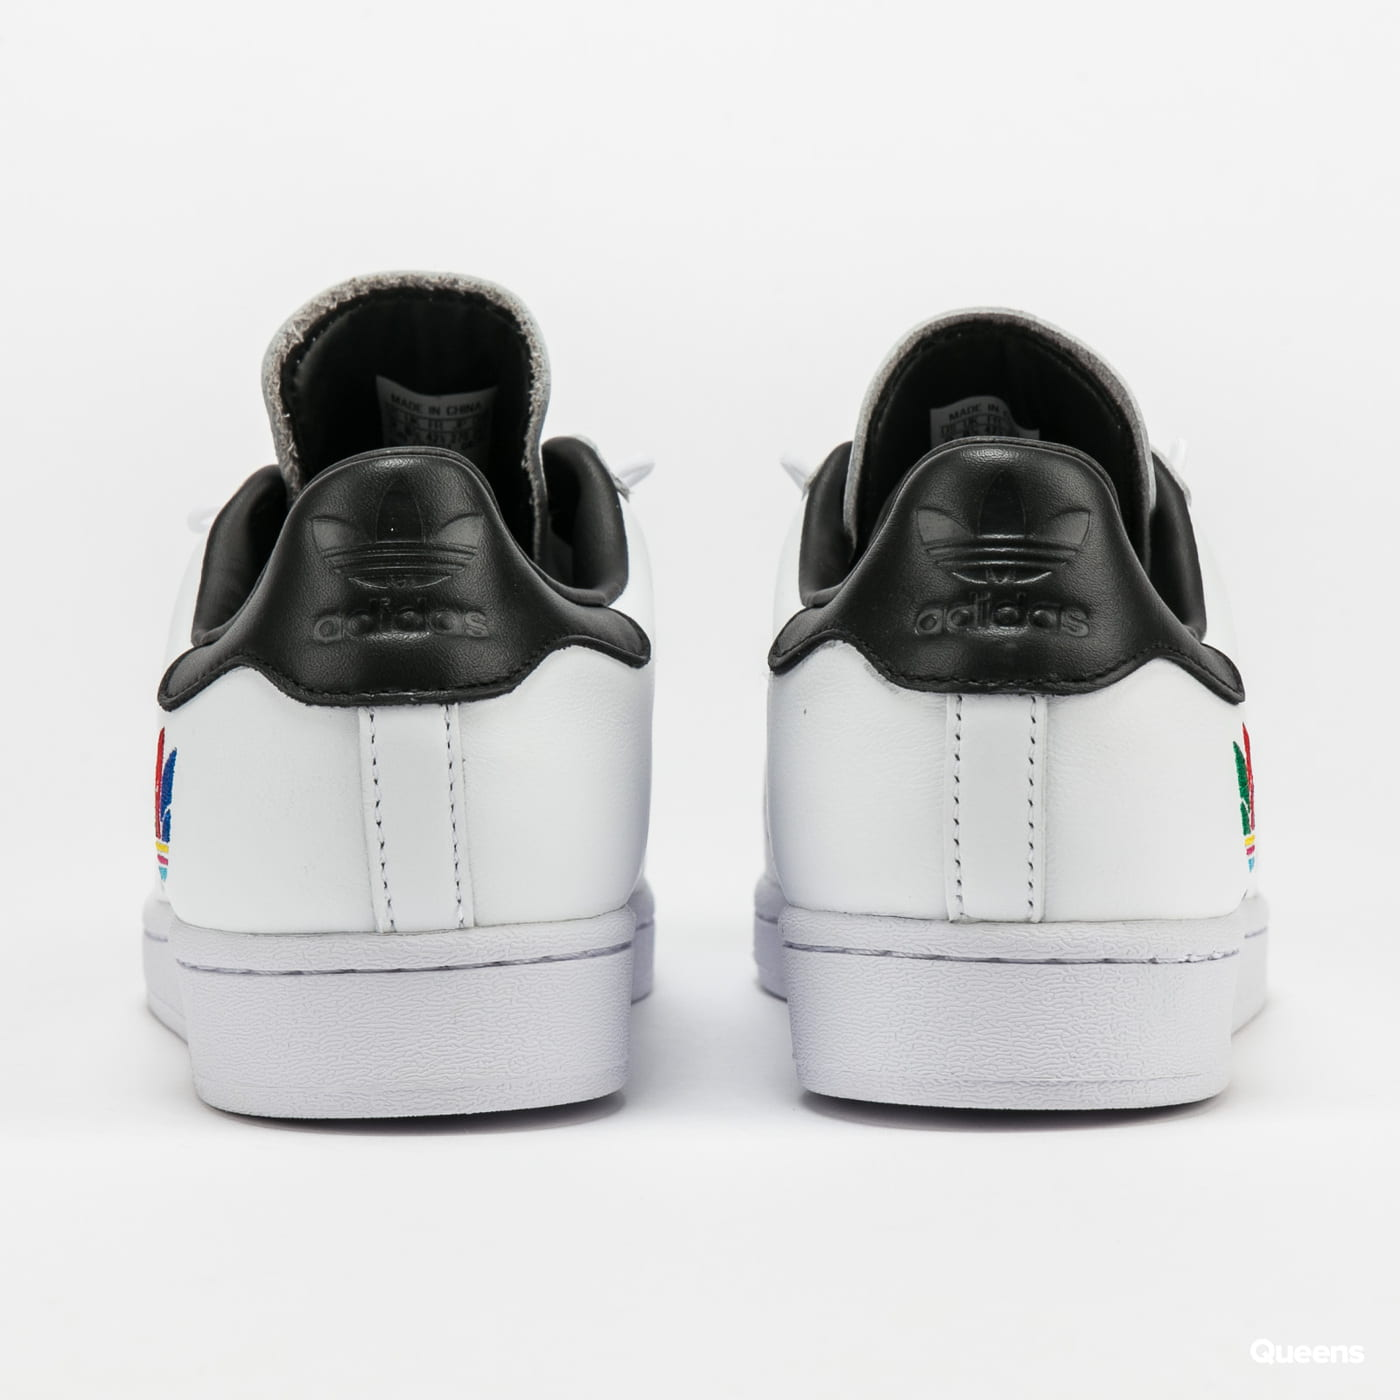 adidas Originals Superstar green / cblack / cblack